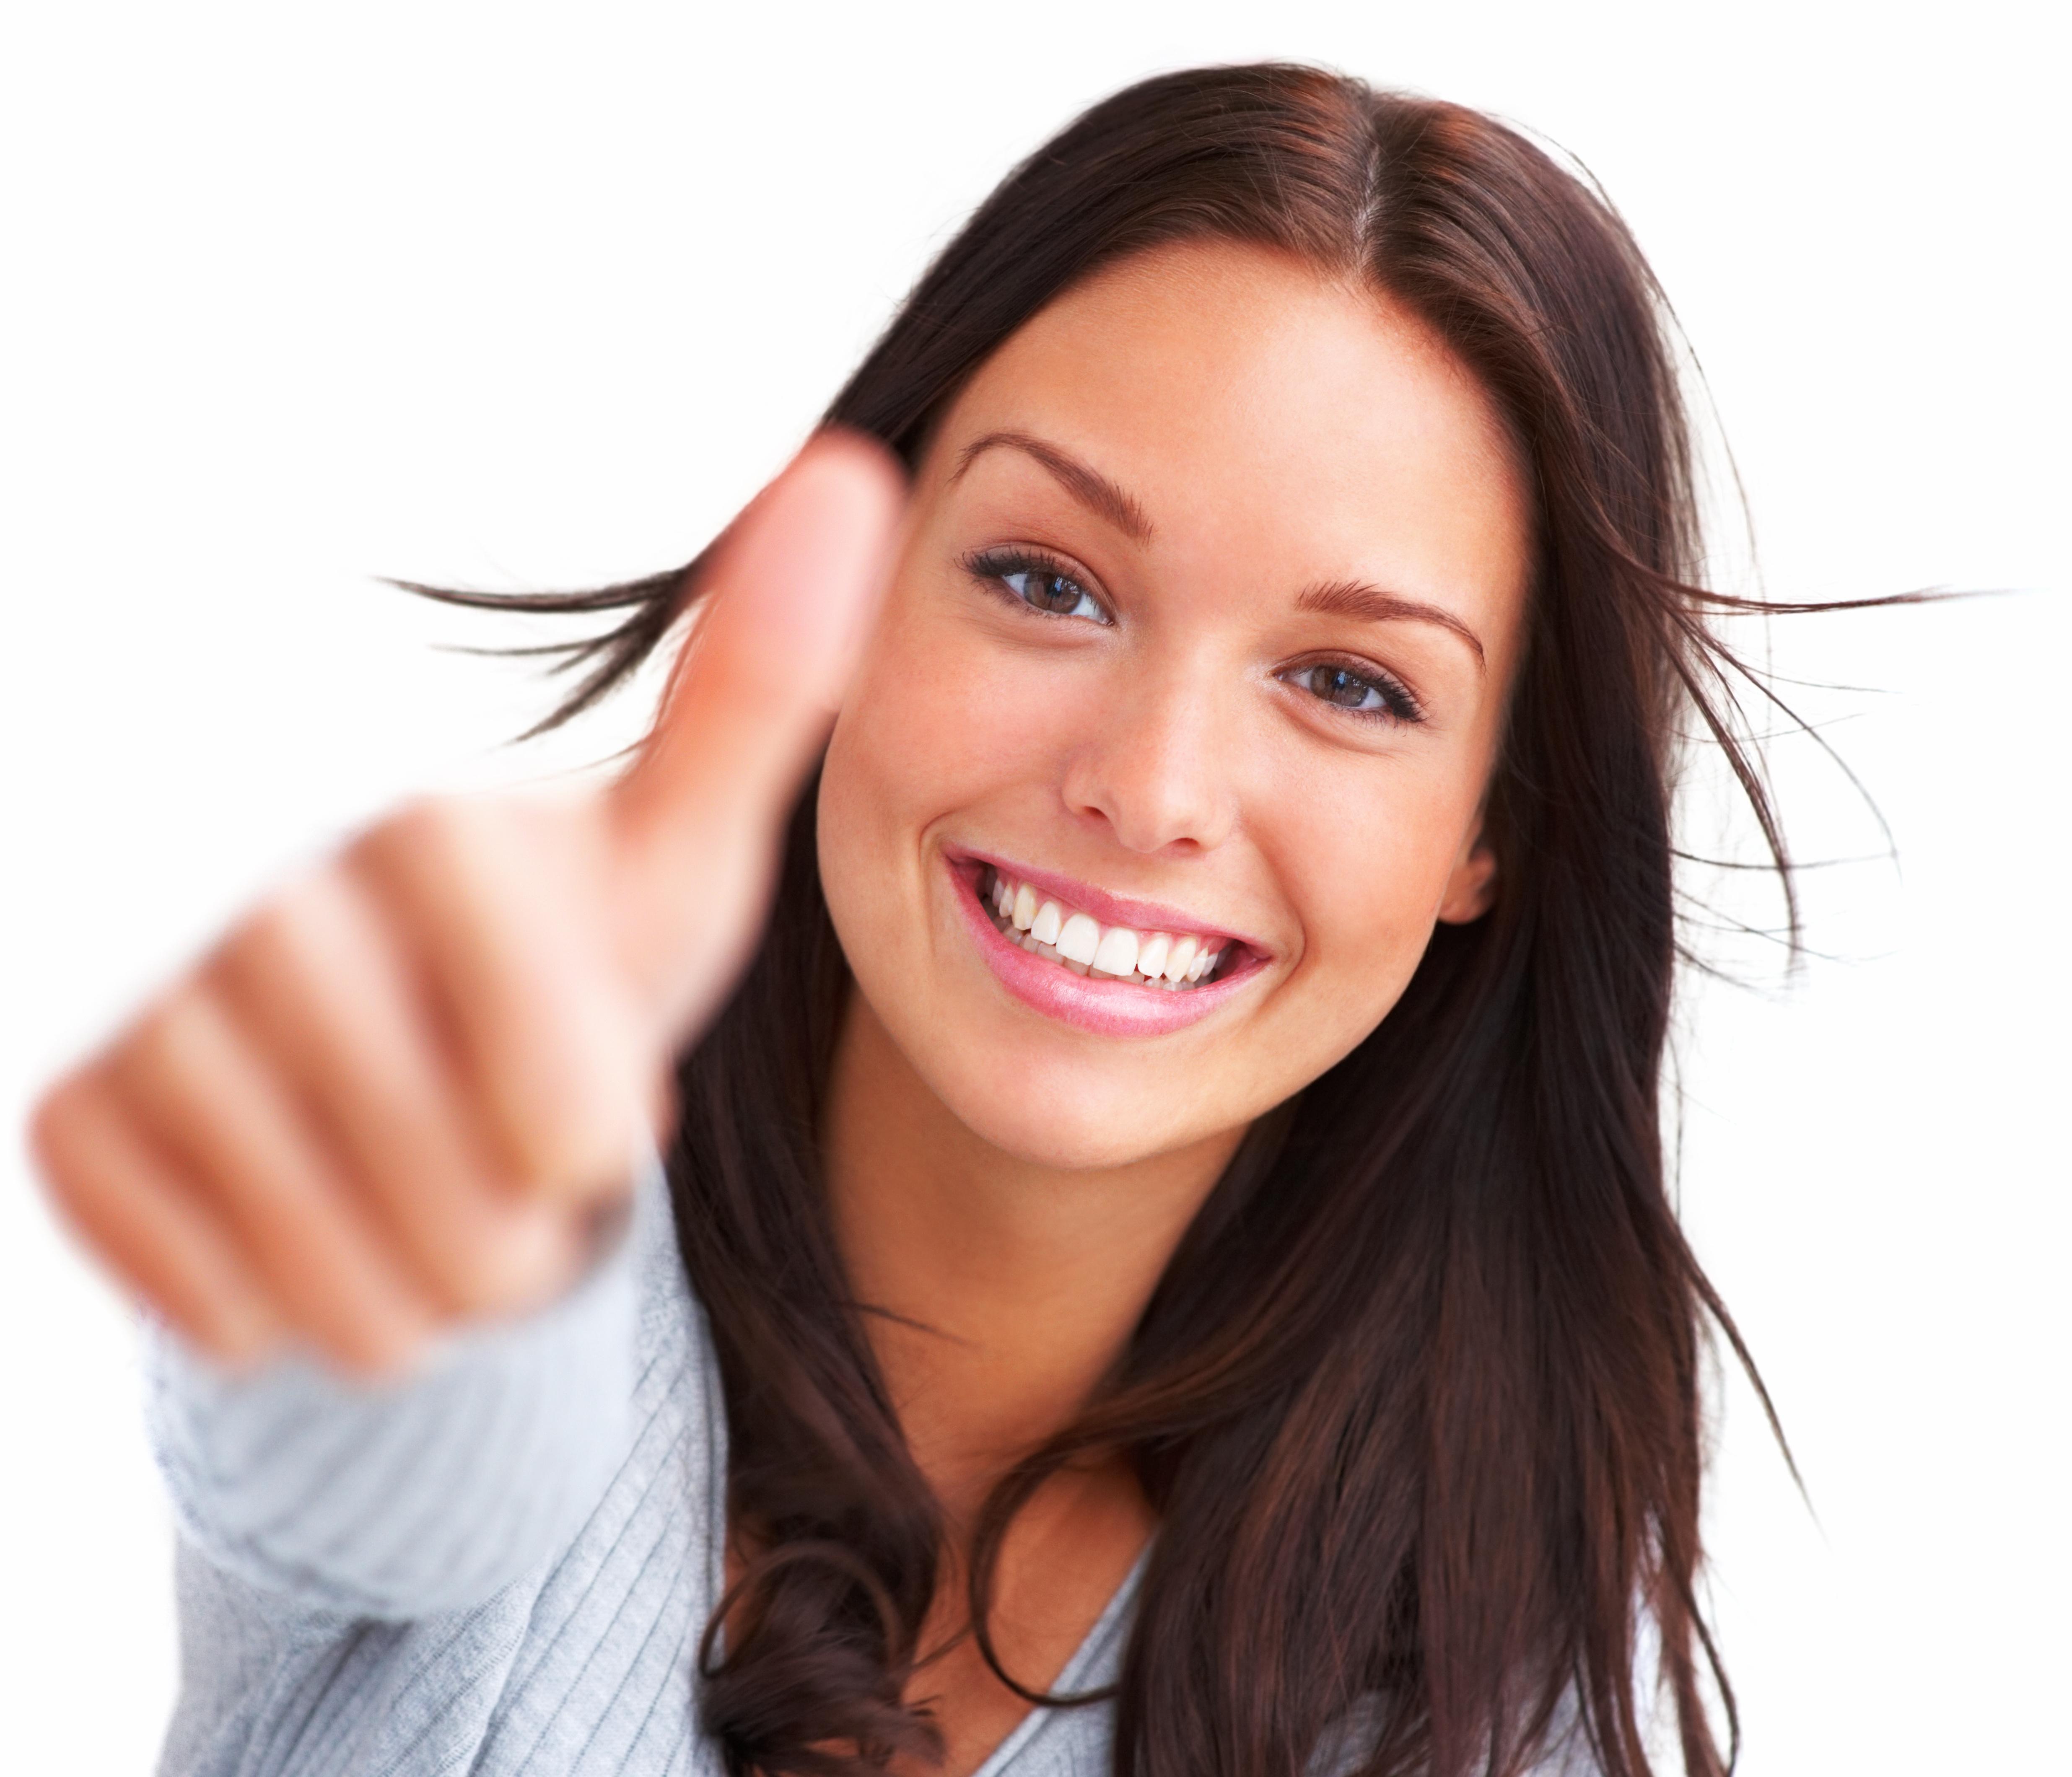 Happy woman Fotolia, via The Myndset Social Media Marketing